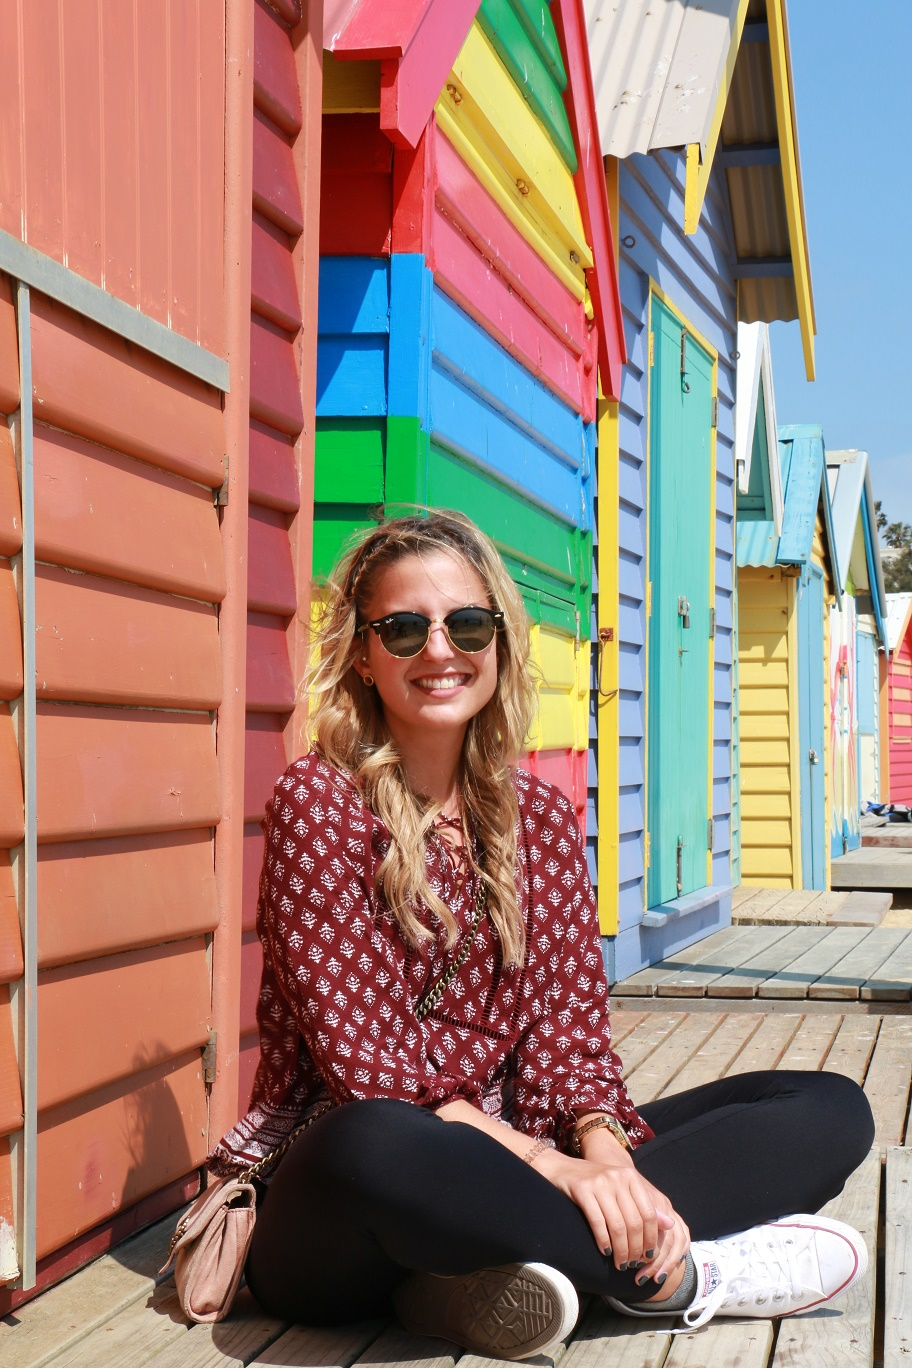 melbourne-brighton-beach-boxes-2-thebraidedgirl